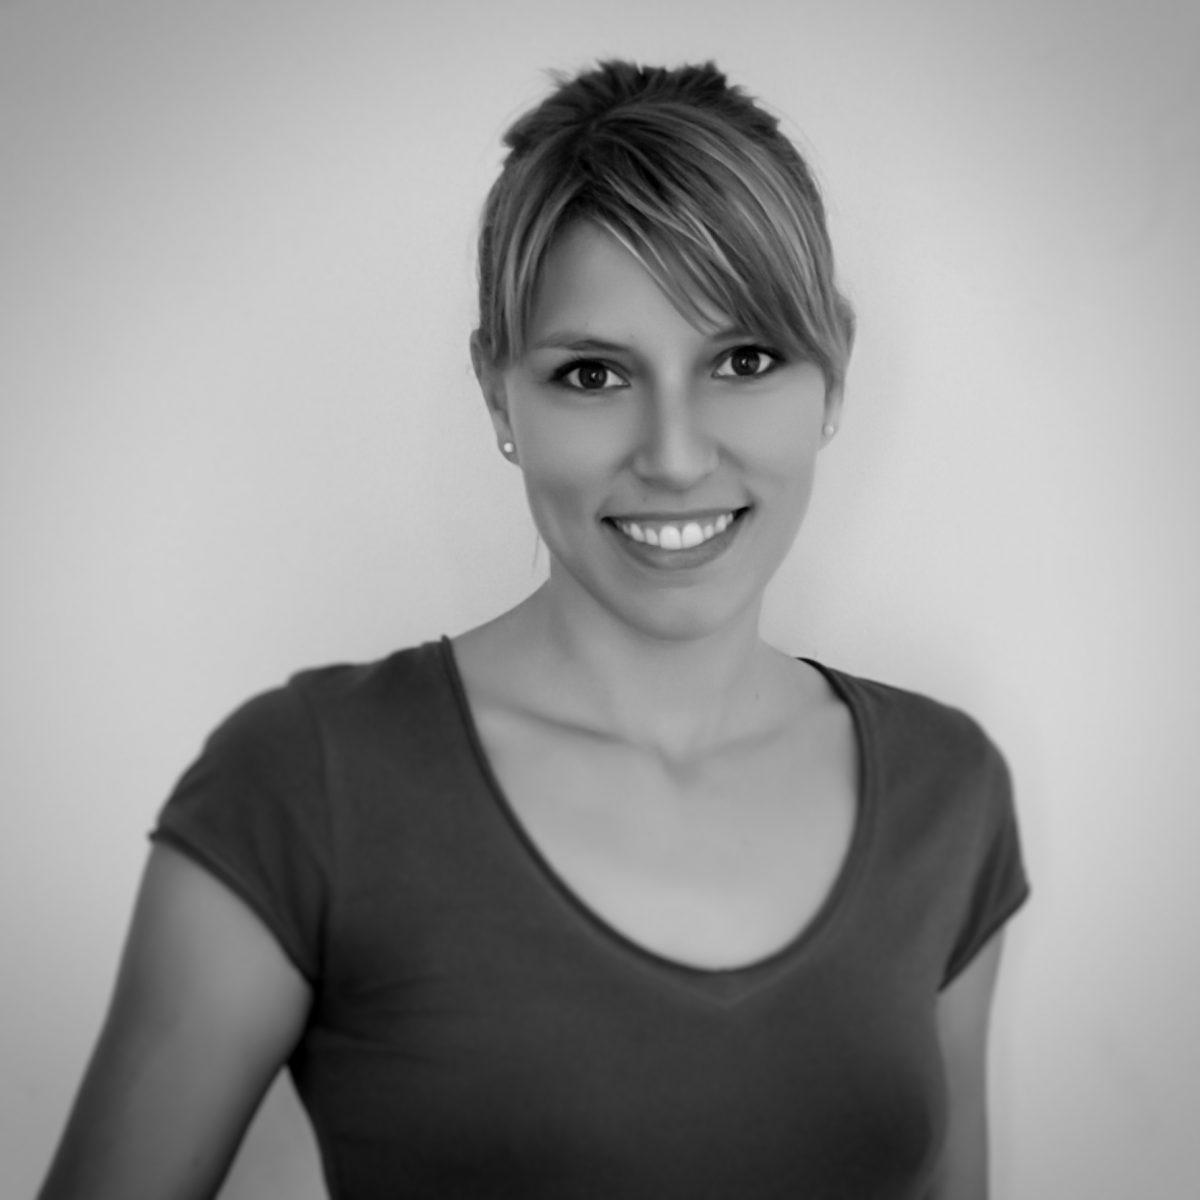 Nathalie Meissner